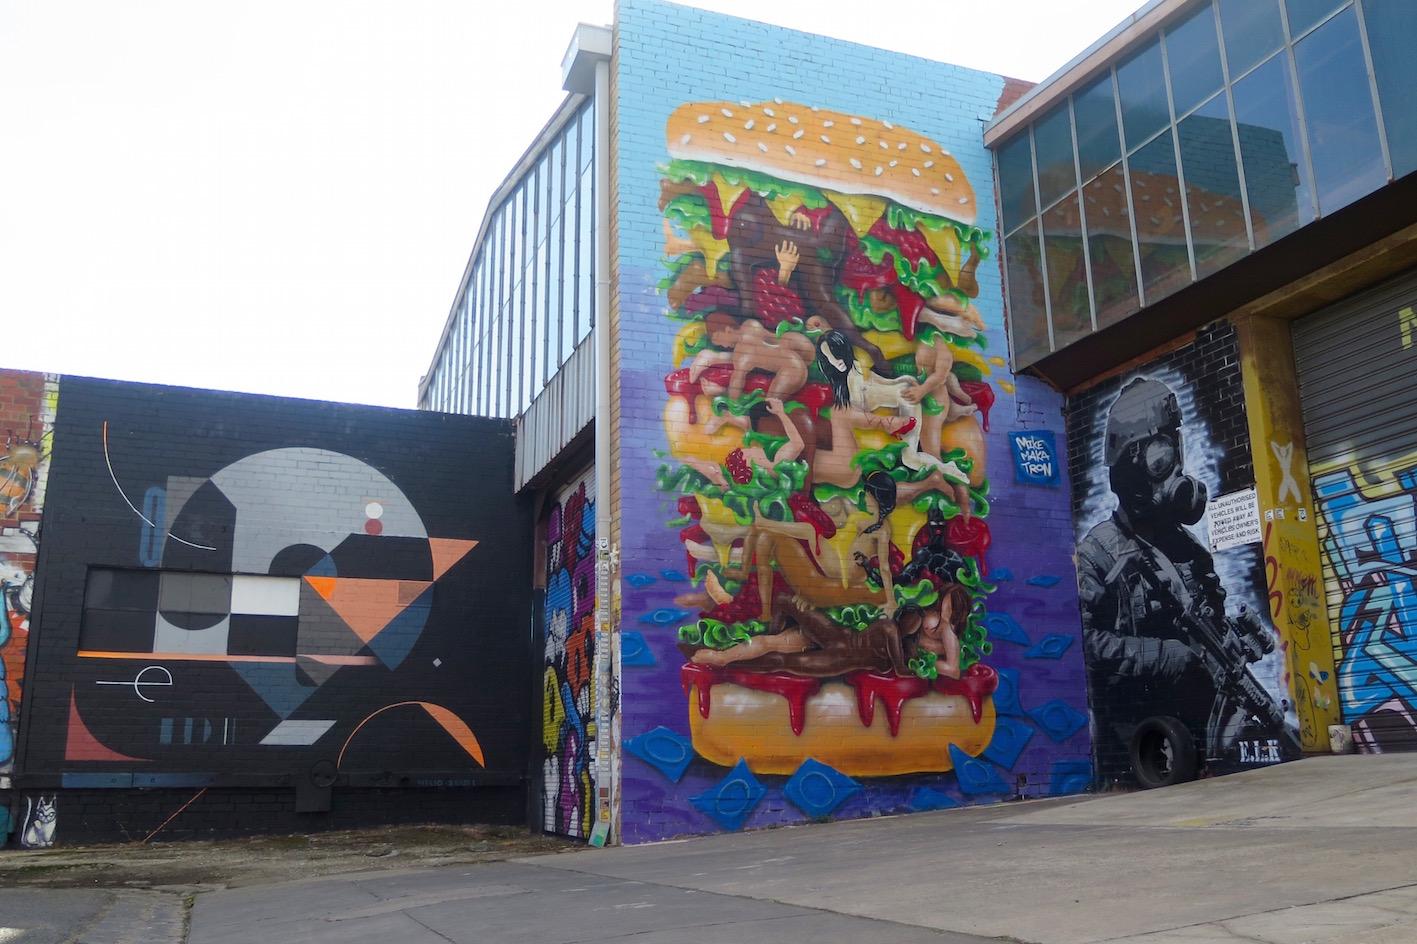 deansunshine_landofsunshine_melbourne_streetart_graffiti_Makatron kama Sutra burger 3